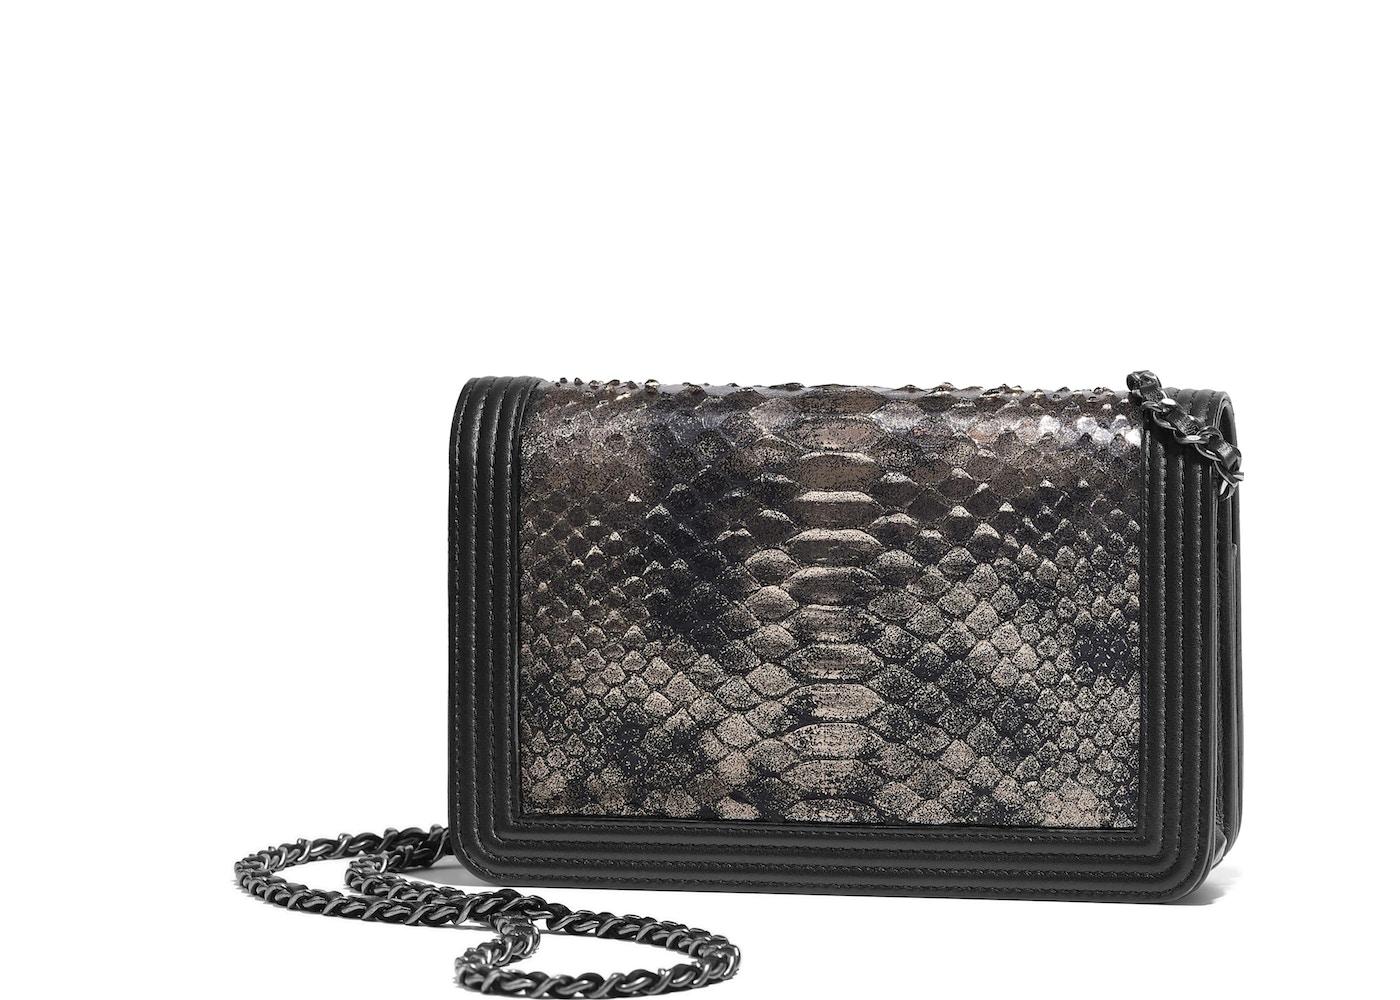 0f10473ec454 Chanel Boy Wallet On Chain Python Ruthenium-tone Silver/Black